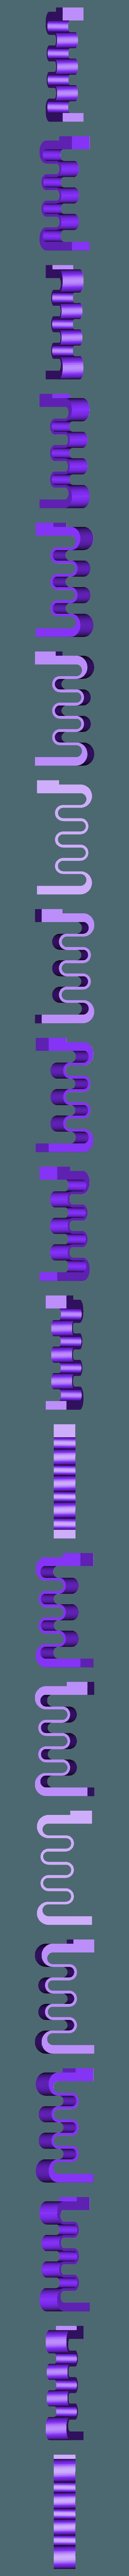 PLA_spring_medium.STL Download free STL file Printed truck V2: PLA springs • 3D printer object, MrCrankyface